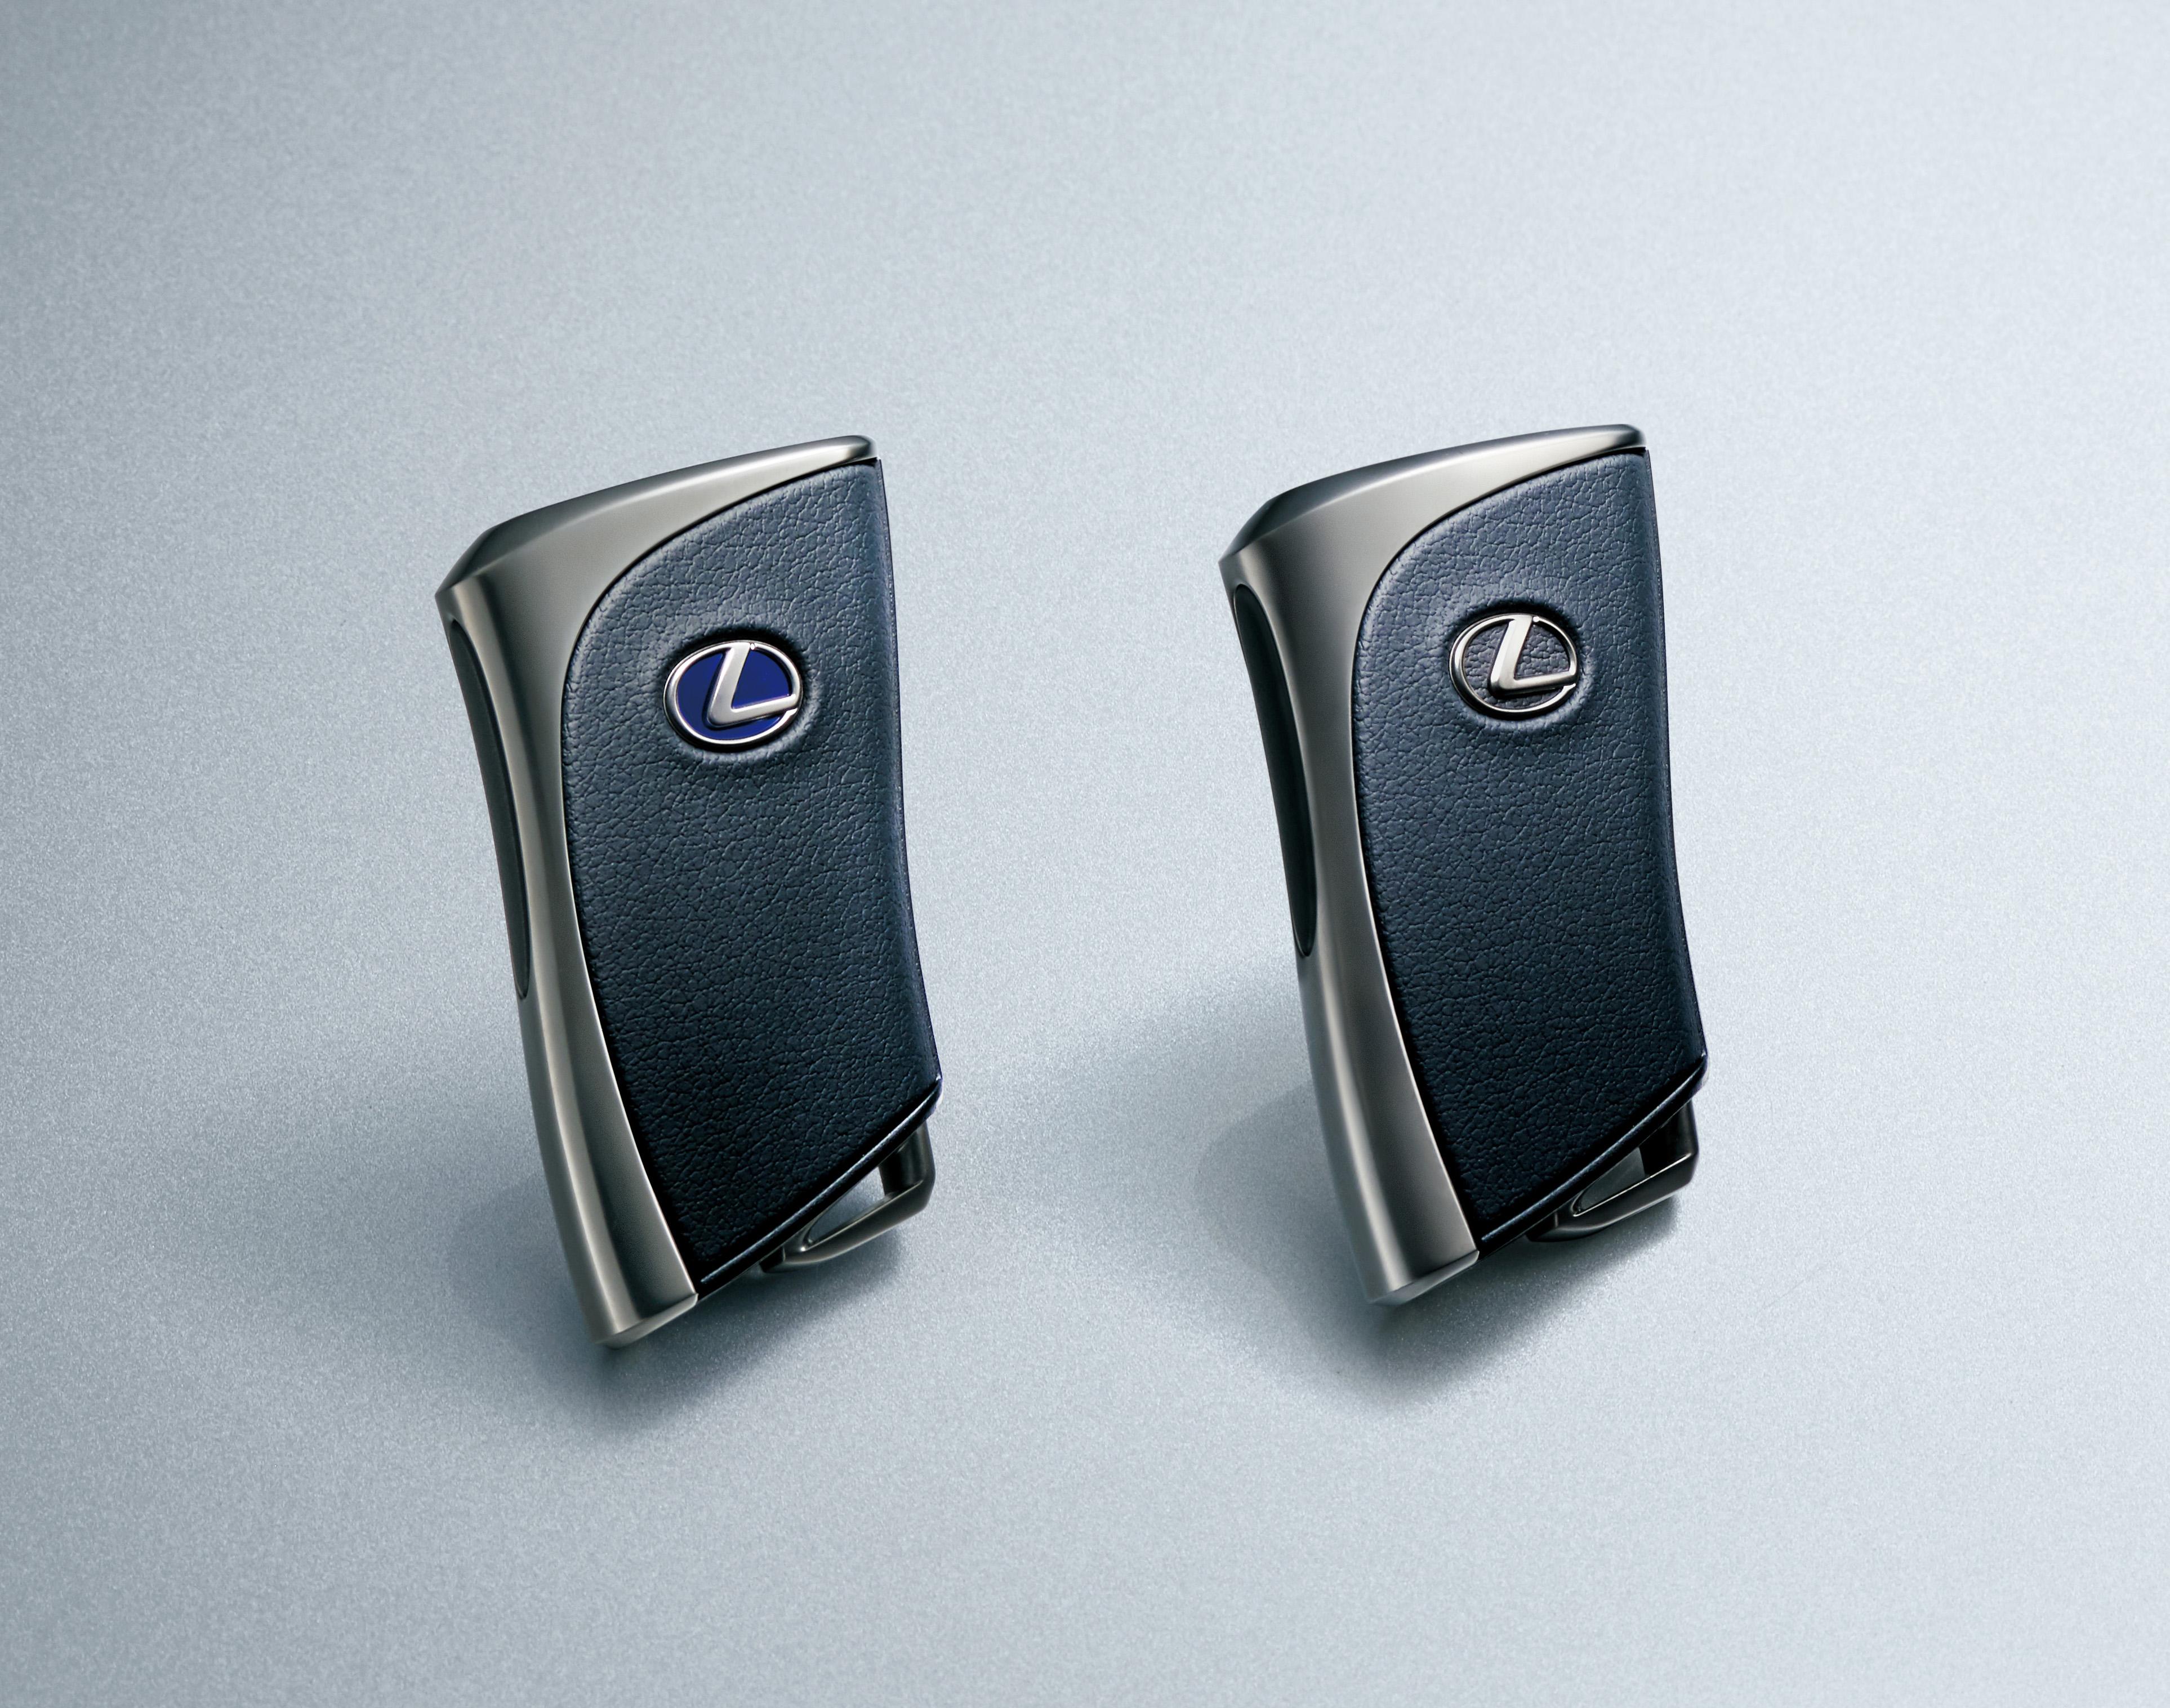 Lexus Lc 双门四座位跑车日本开售 价格从rm508k起 Lexus Lc 500 Smart